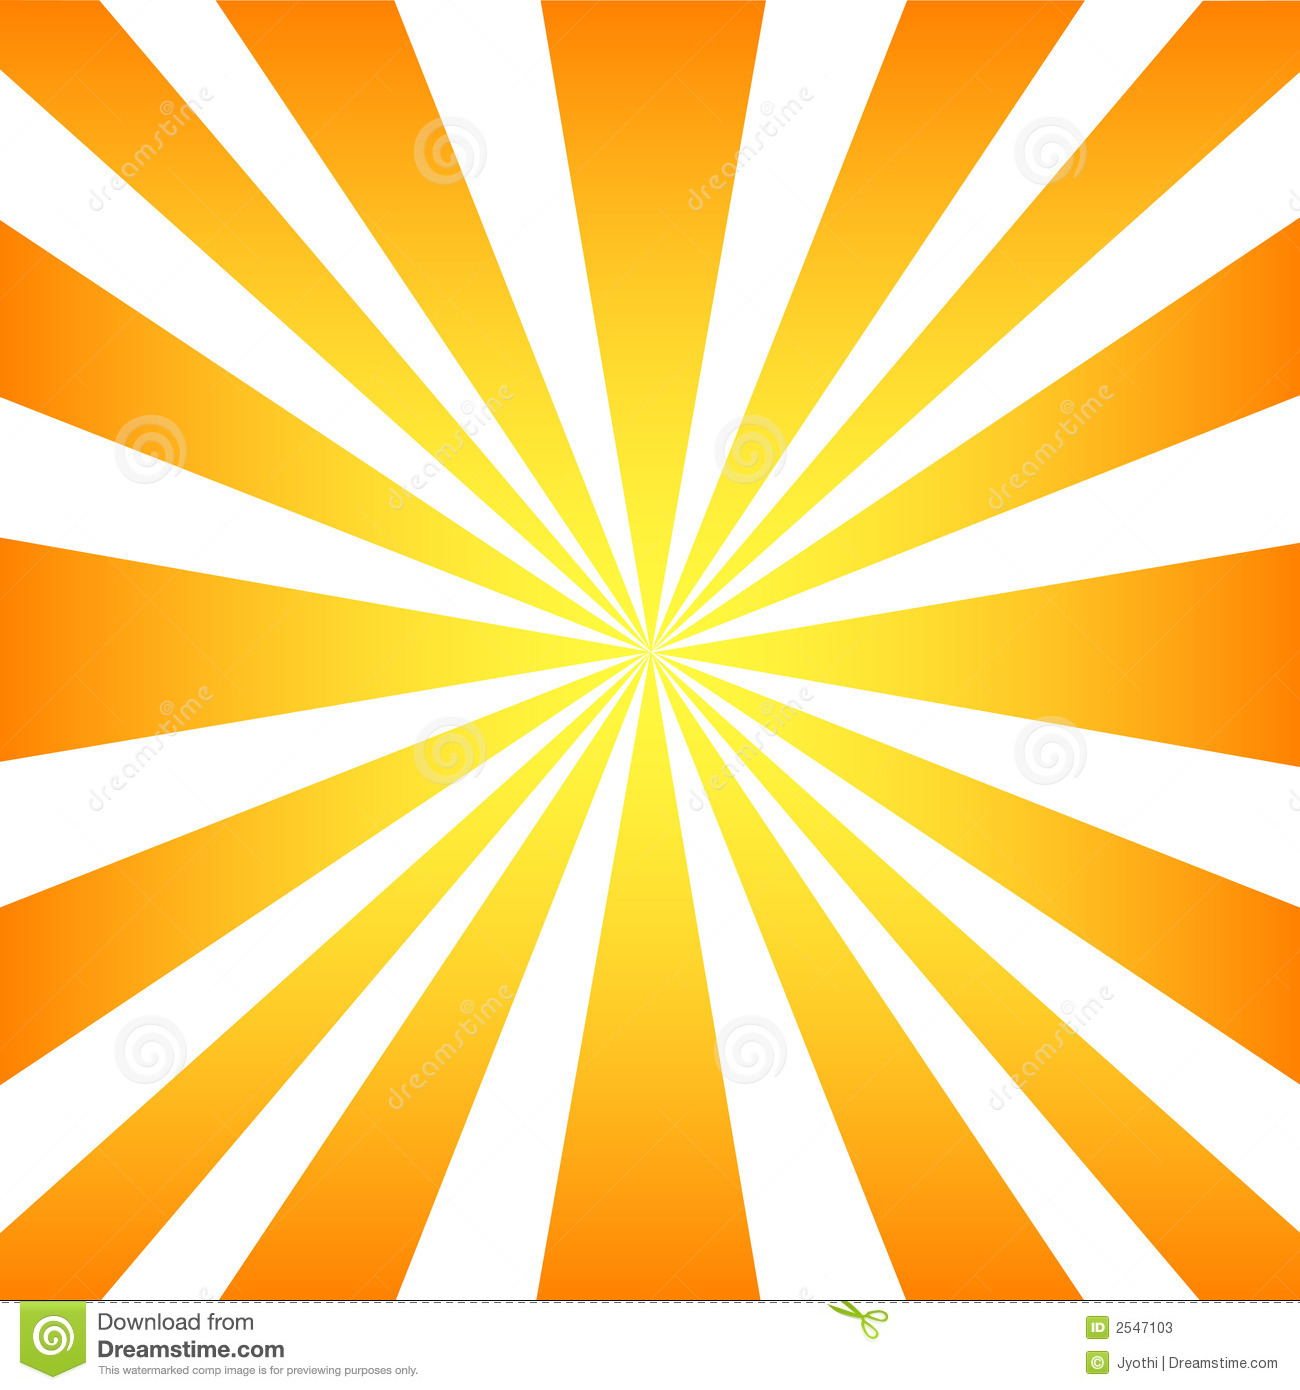 Sun Rays Clipart - Clipart Suggest